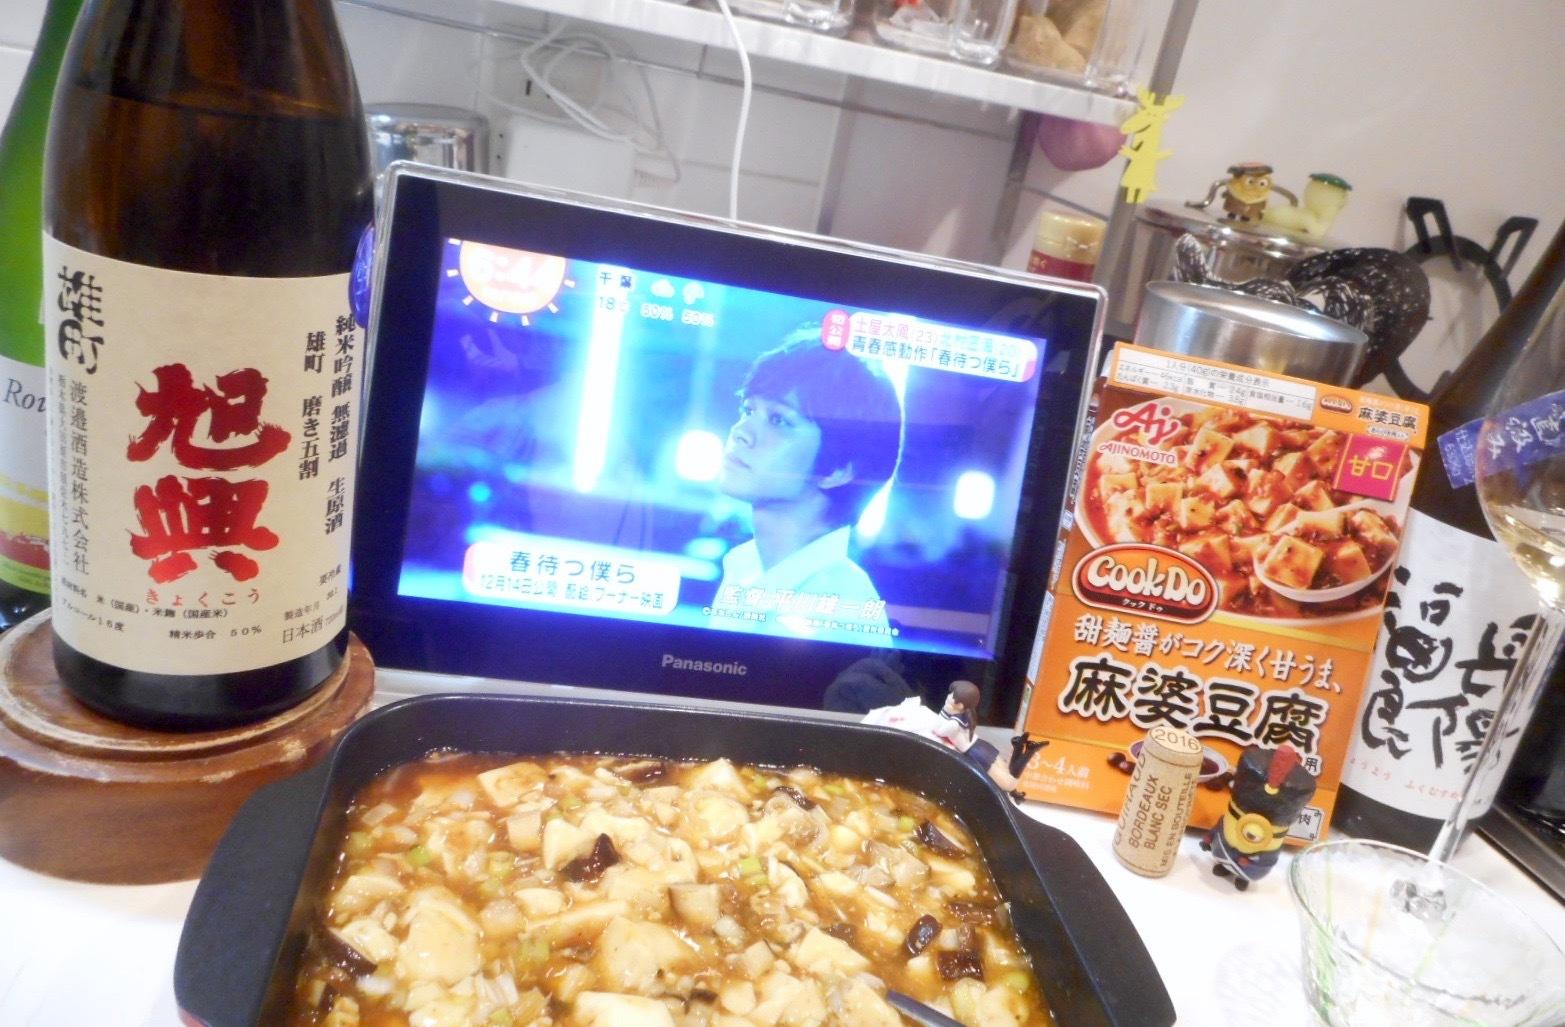 kyokukou_omachi50namagen29by3_1.jpg